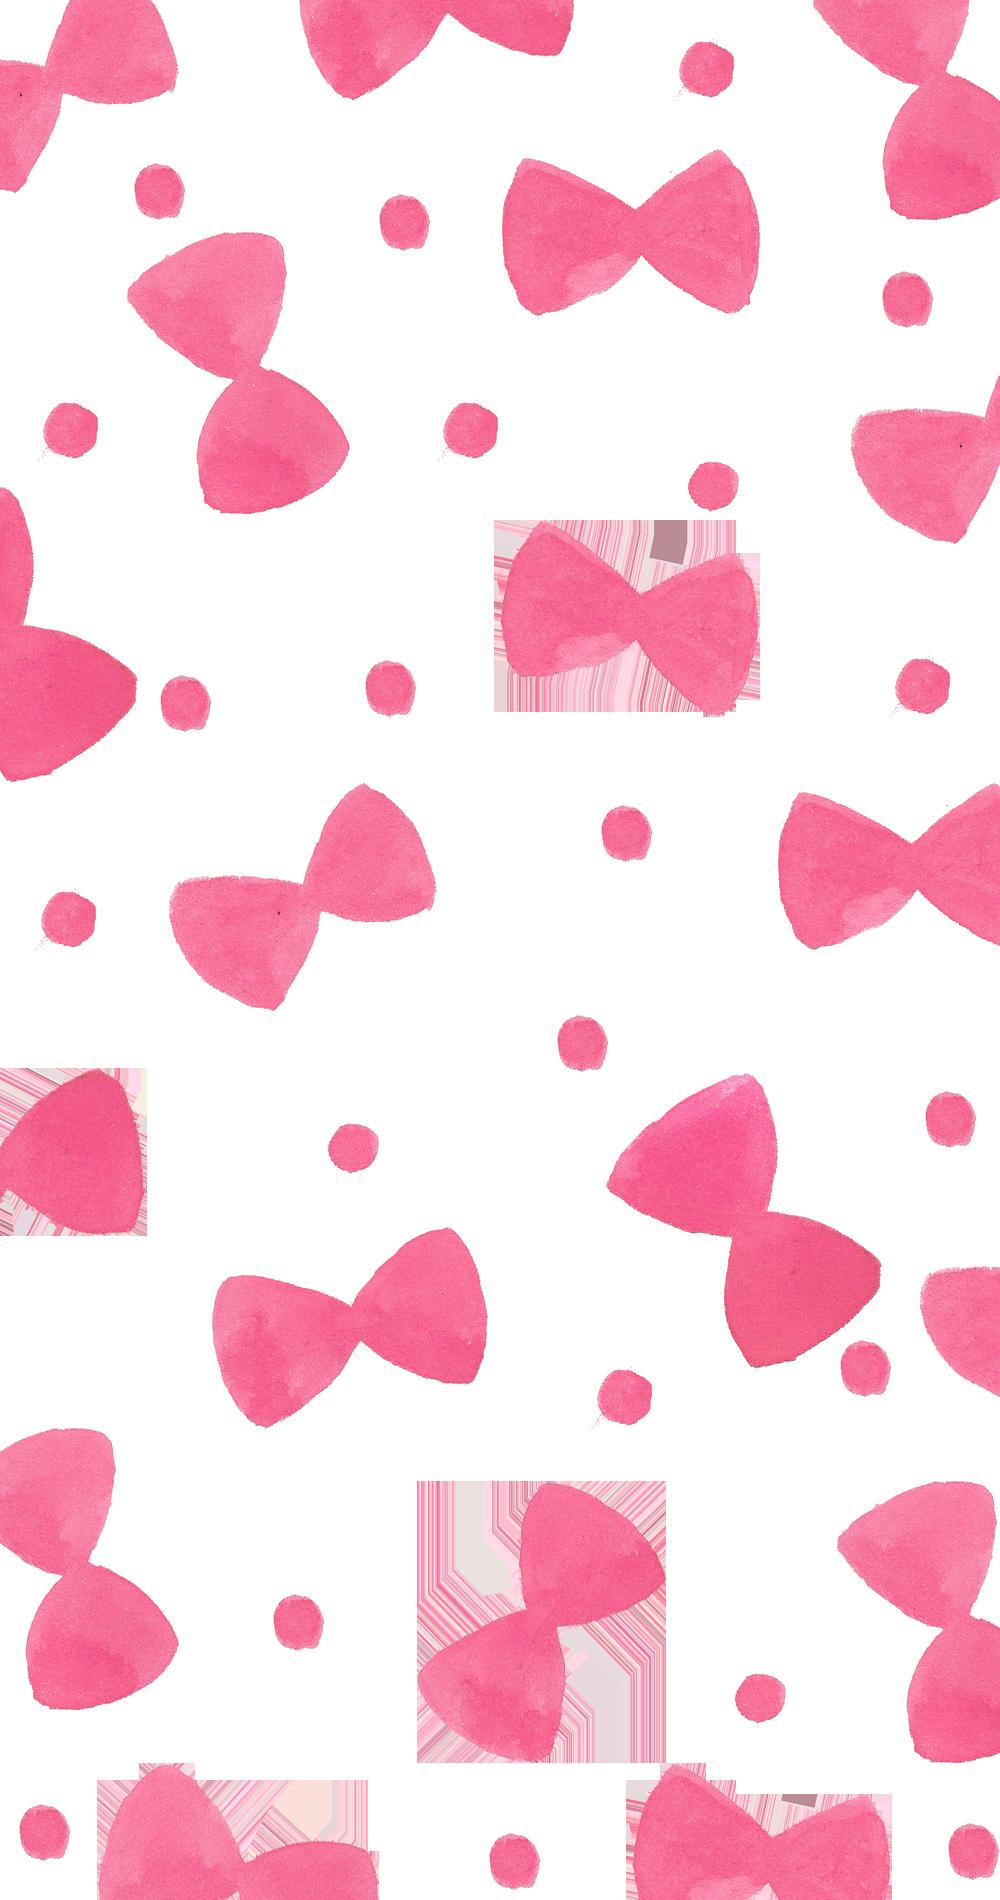 Pink Ribbons Casetify Iphone Art Design Illustrations